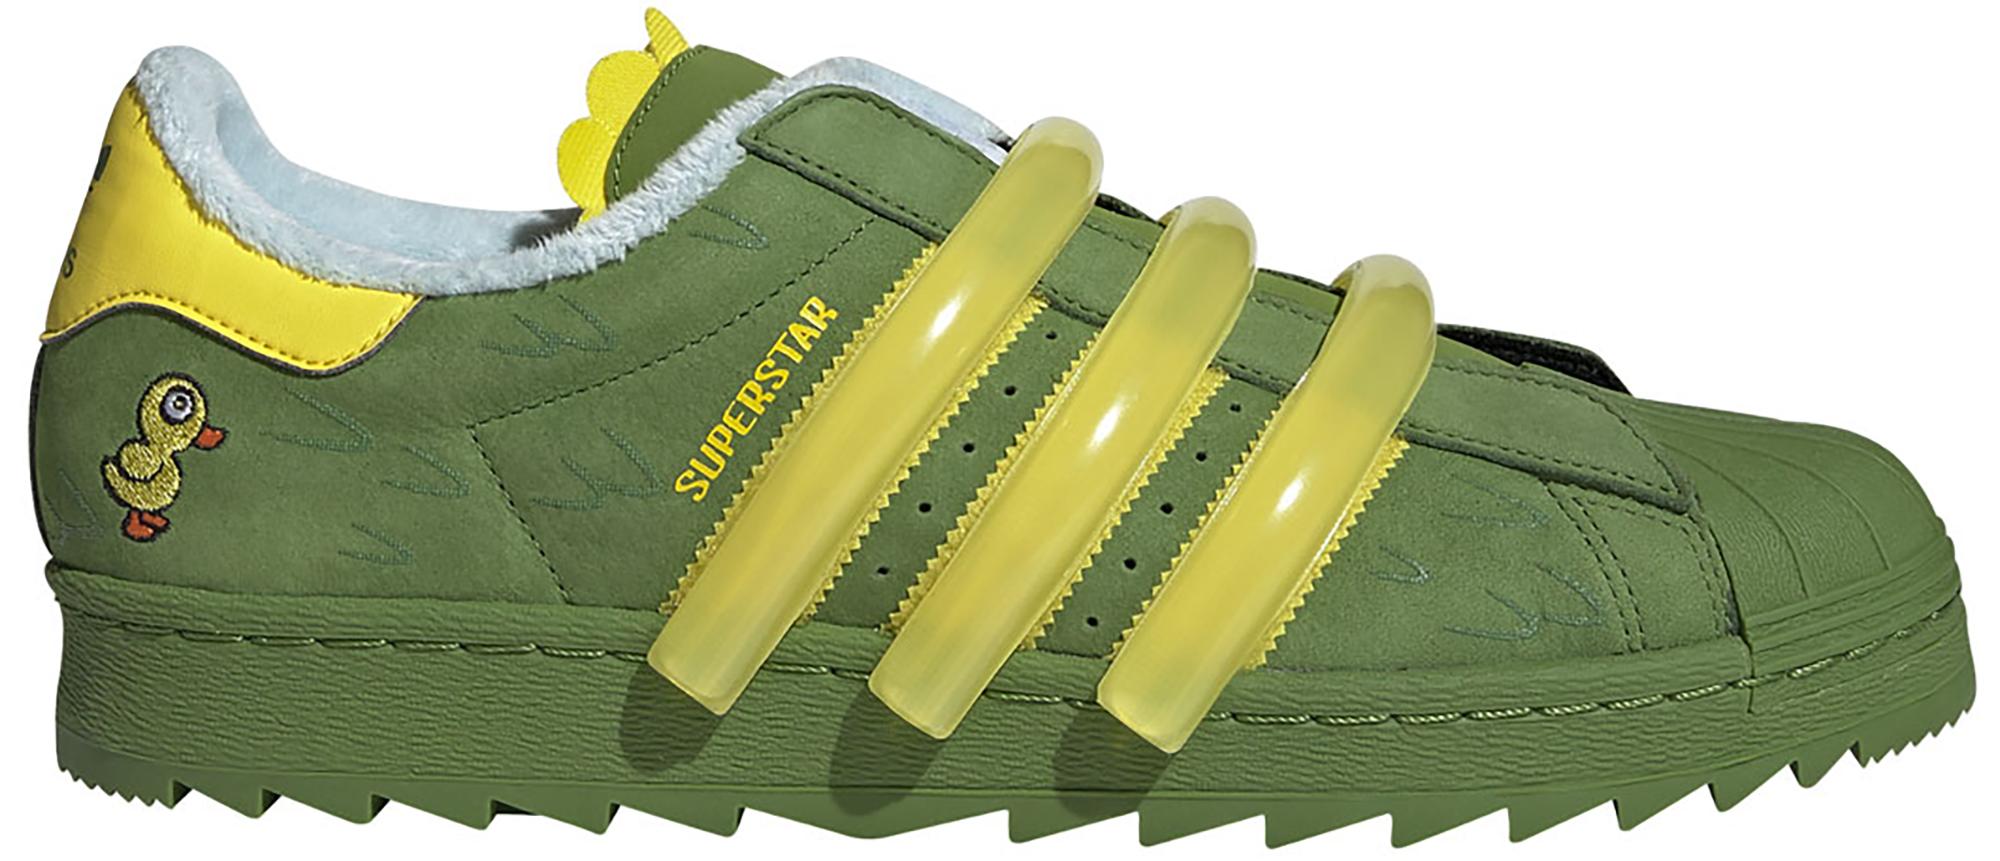 adidas Superstar 80s TR Melting Sadness